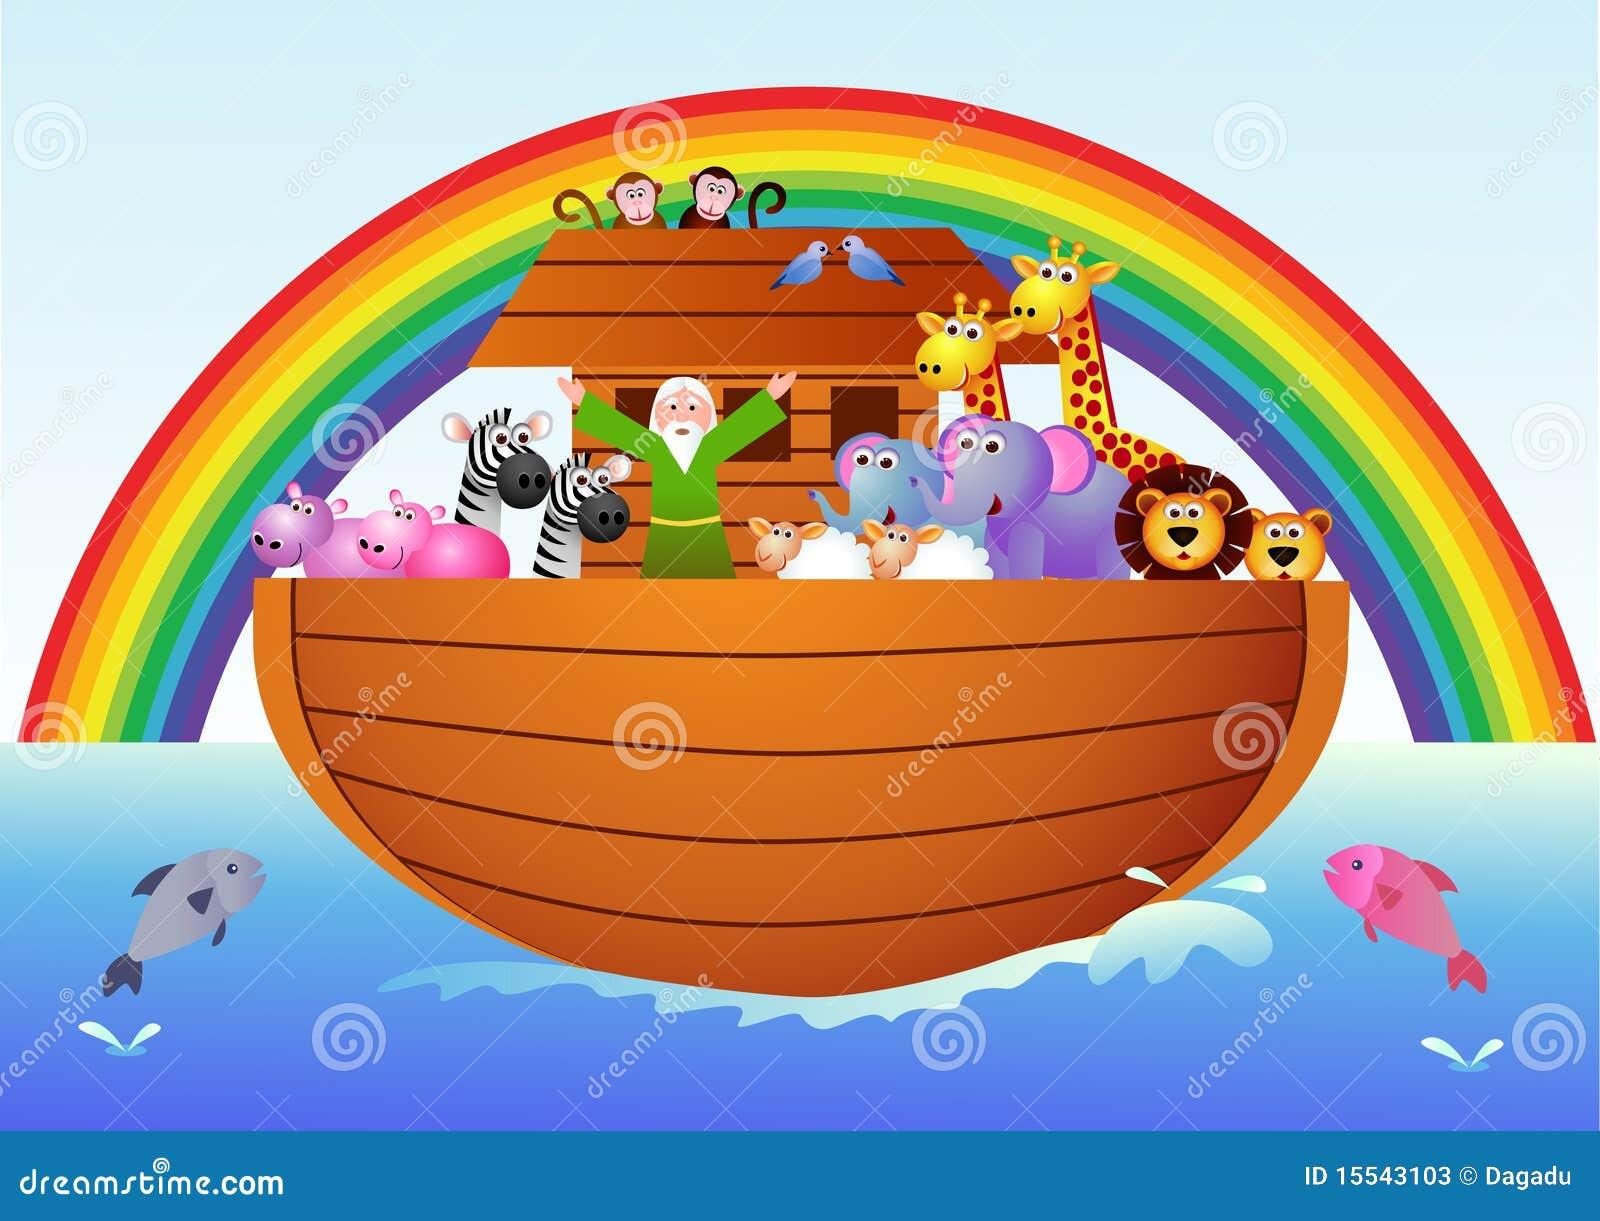 Stock Photo: Noah's Ark. Image: